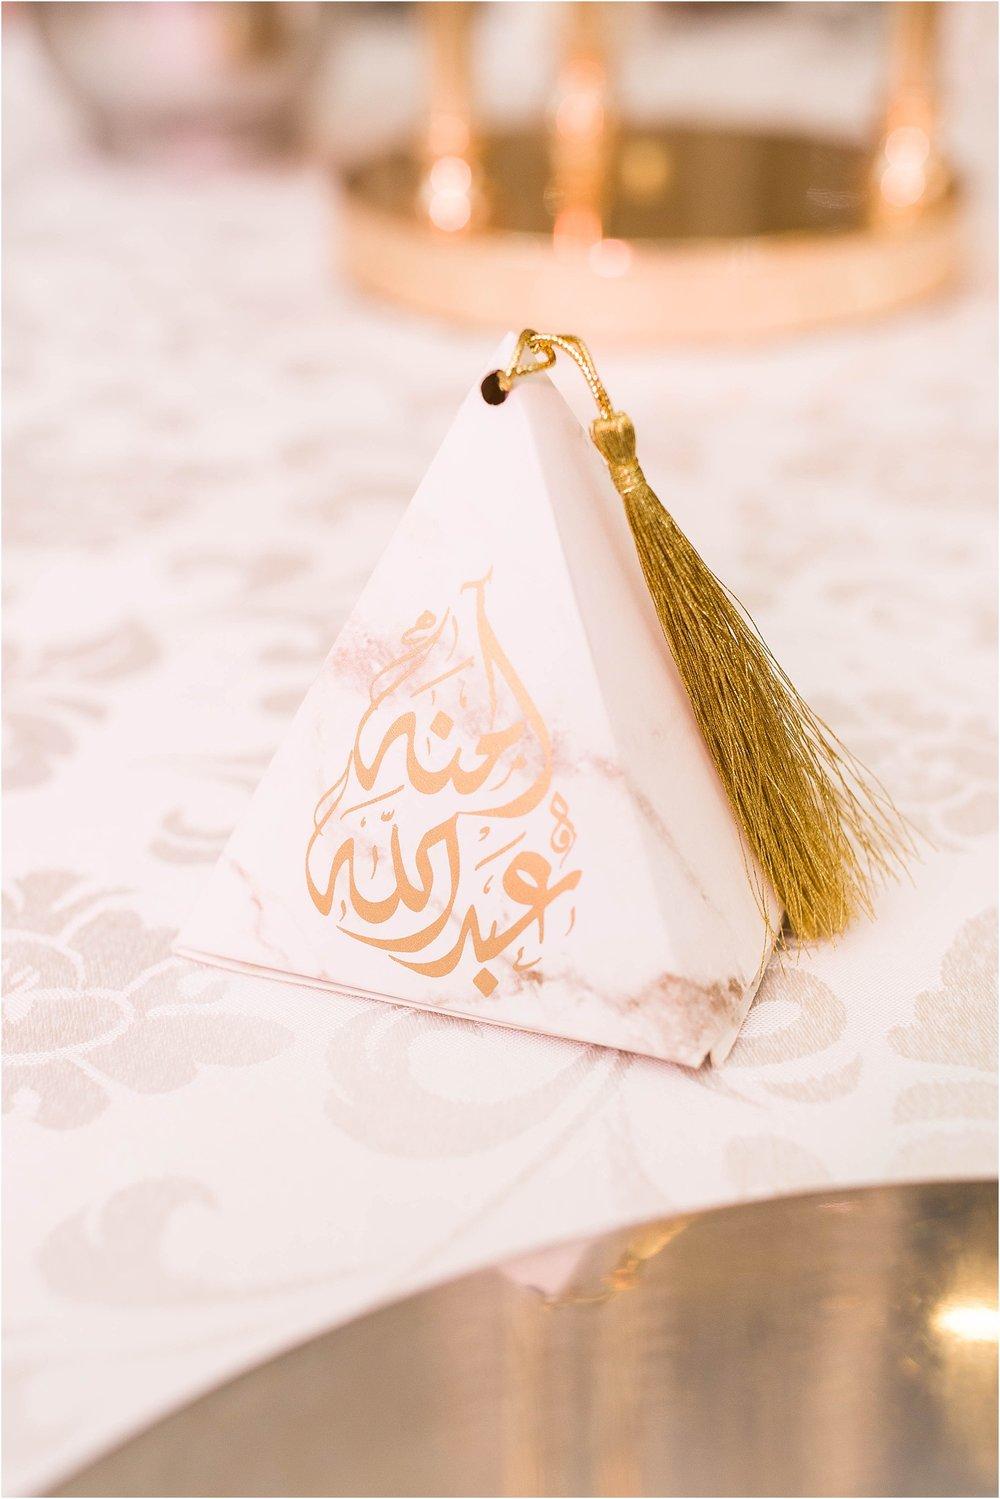 Red-Rose-Convention-Mint-Room-Wedding-Toronto-Mississauga-Brampton-Scarborough-GTA-Pakistani-Indian-Wedding-Engagement-Photographer-Photography_0121.jpg